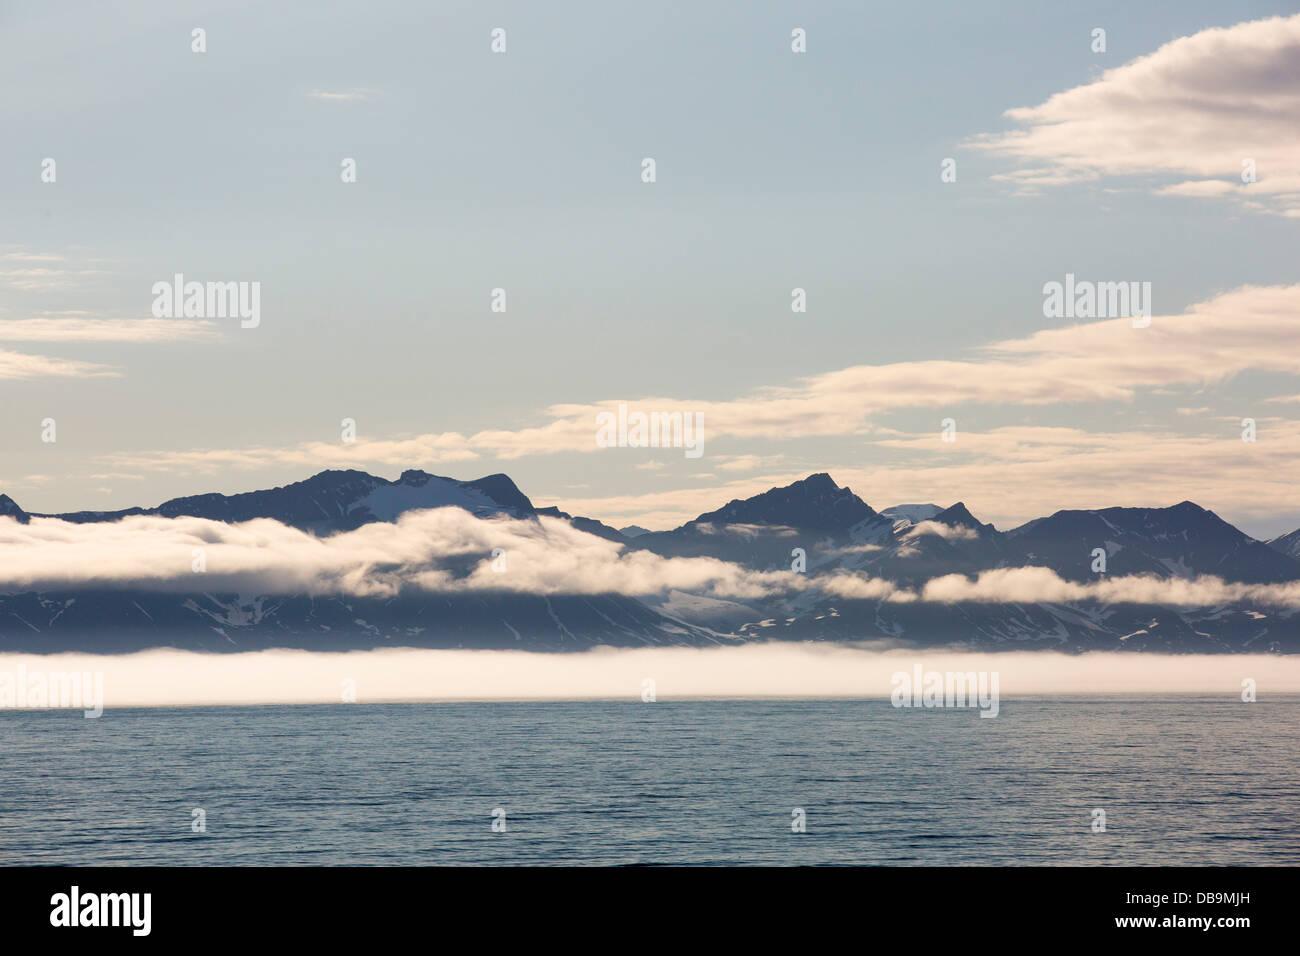 Coastal mountains on the side of Isfjorden on Spitsbergen, Svalbard, Arctic Ocean. Stock Photo